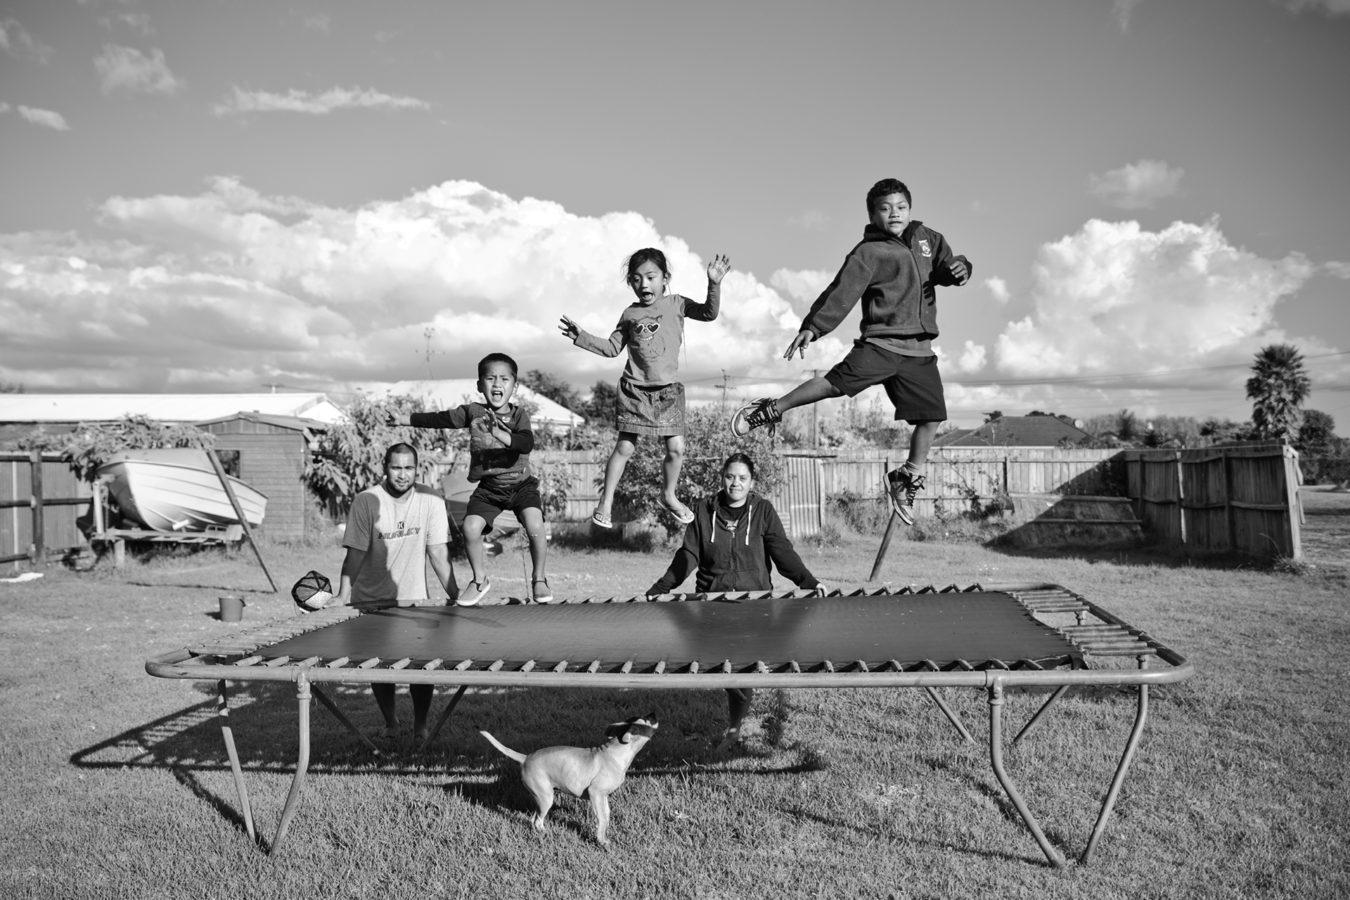 ihumatao, art exhibition, qiane, qiane matata-sipu, mangere arts centre, nga tohu o uenuku, pa life, auckland, maori, indigenous new zealand, black and white photography, auckland festival of photography